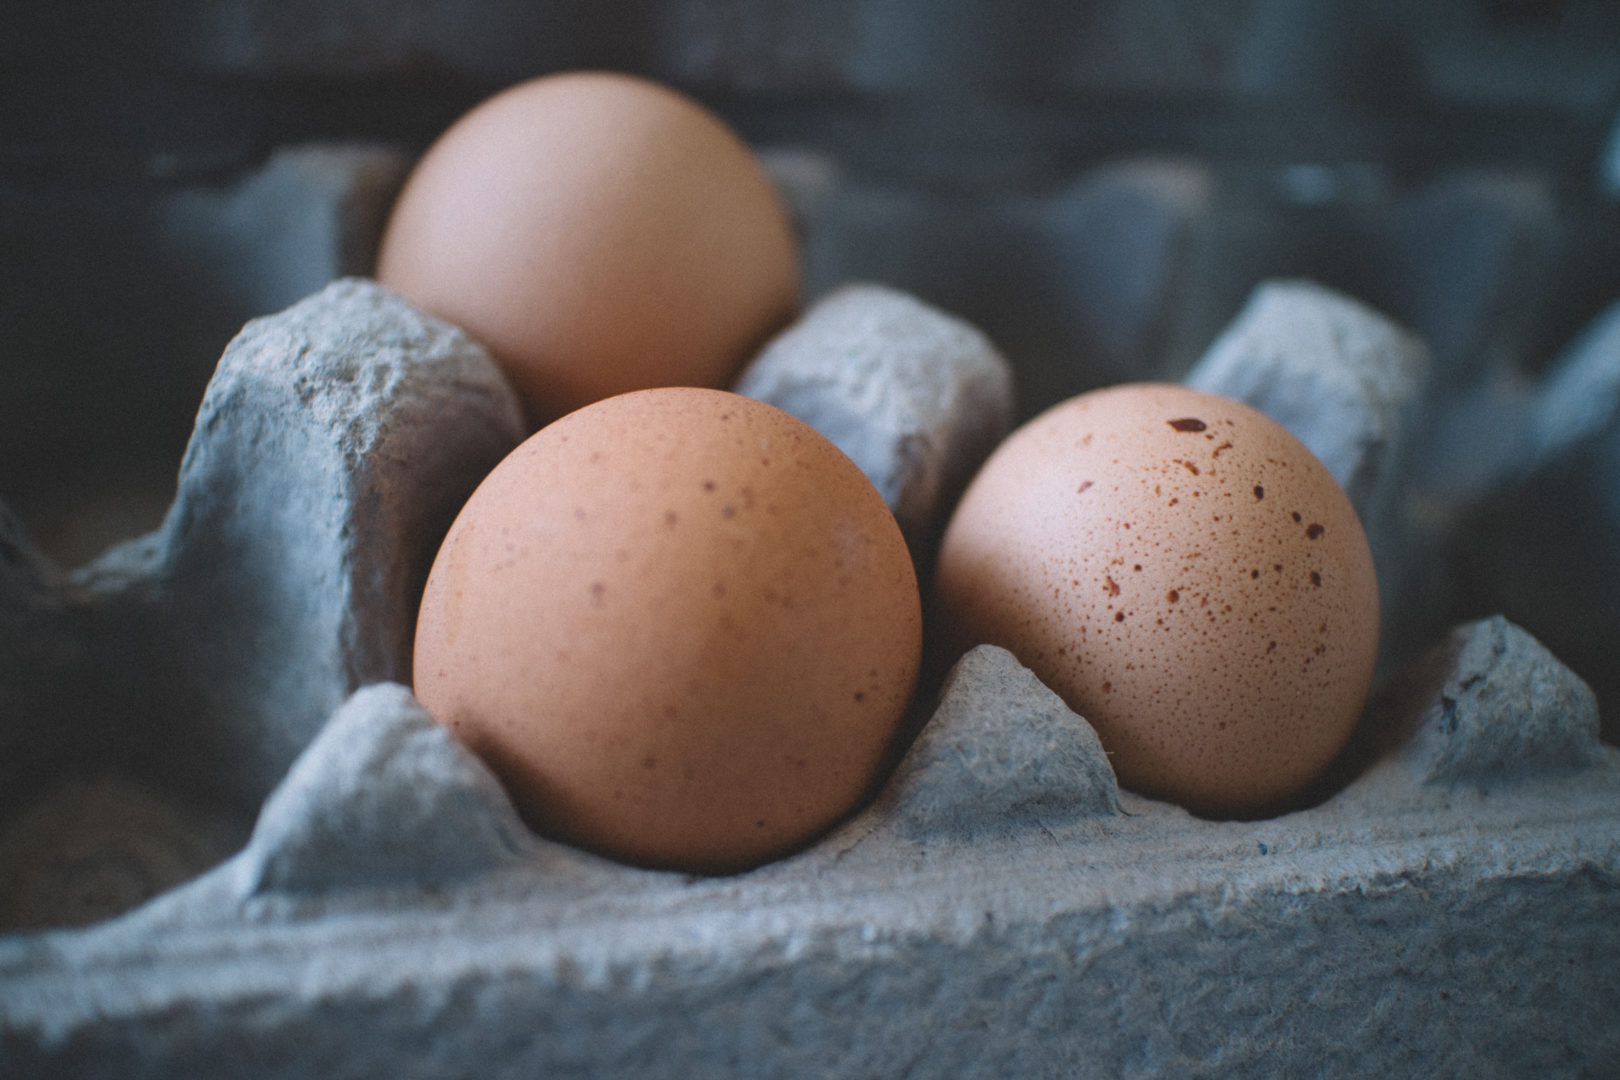 Three eggs sitting in egg carton